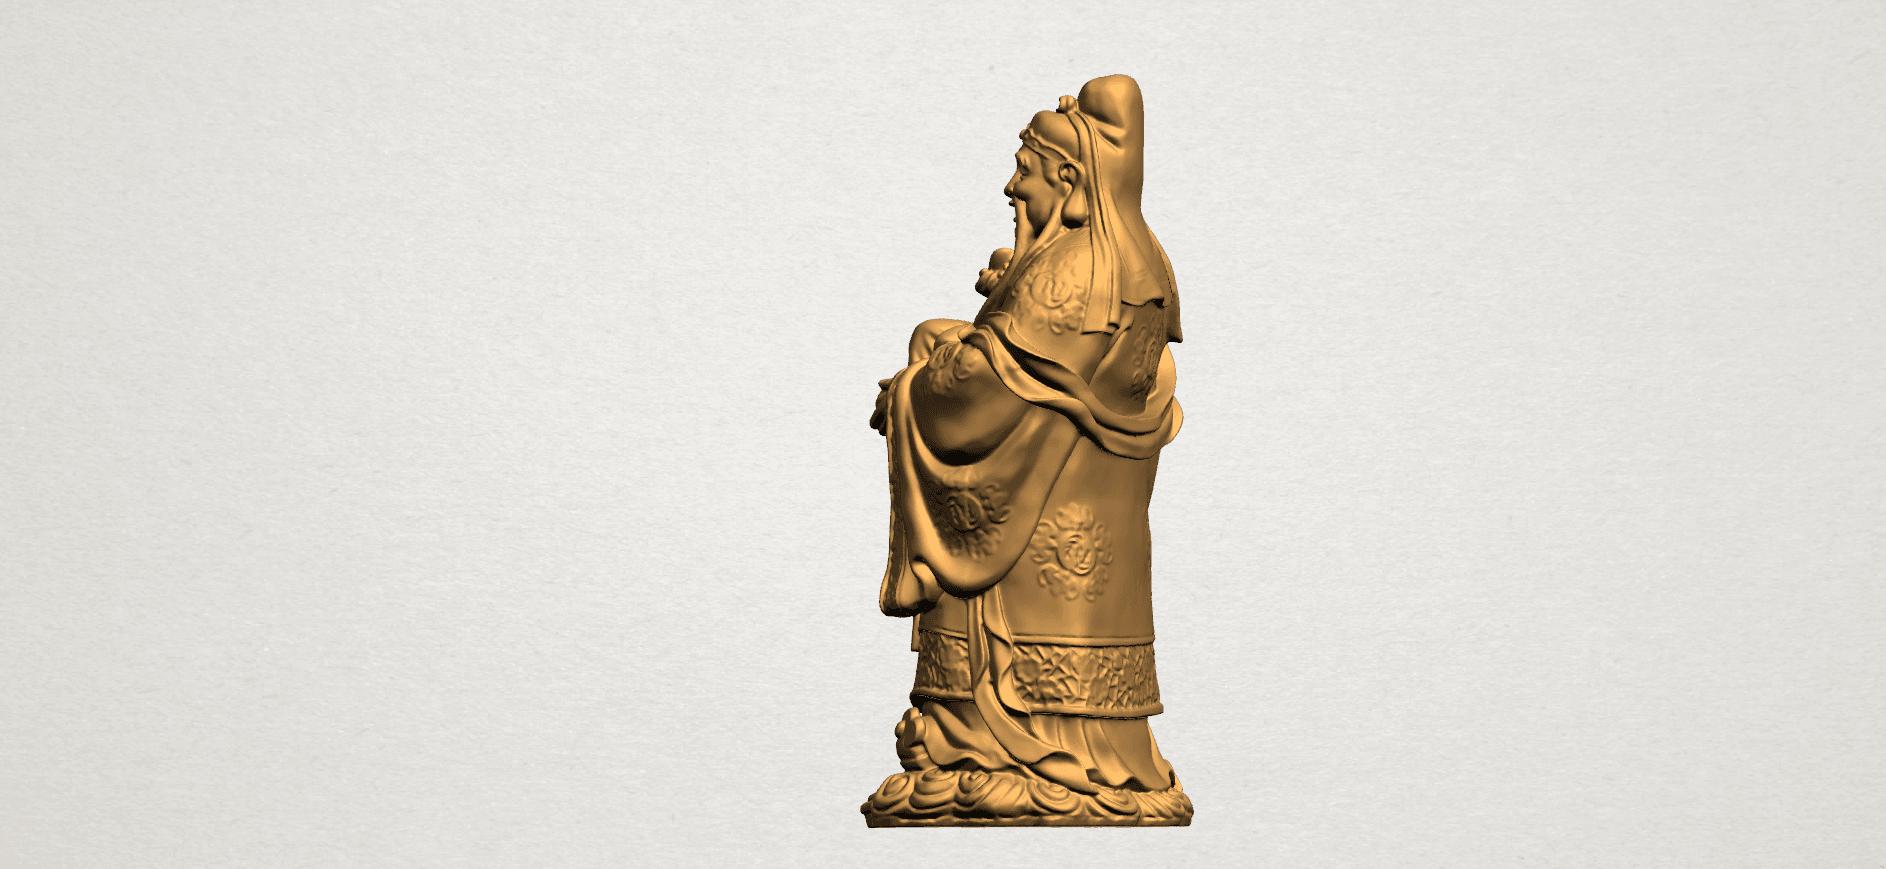 Fook (Fook Look Sao) 80mm - A03.png Télécharger fichier STL gratuit Fook (Fook Look Sao) • Design à imprimer en 3D, GeorgesNikkei